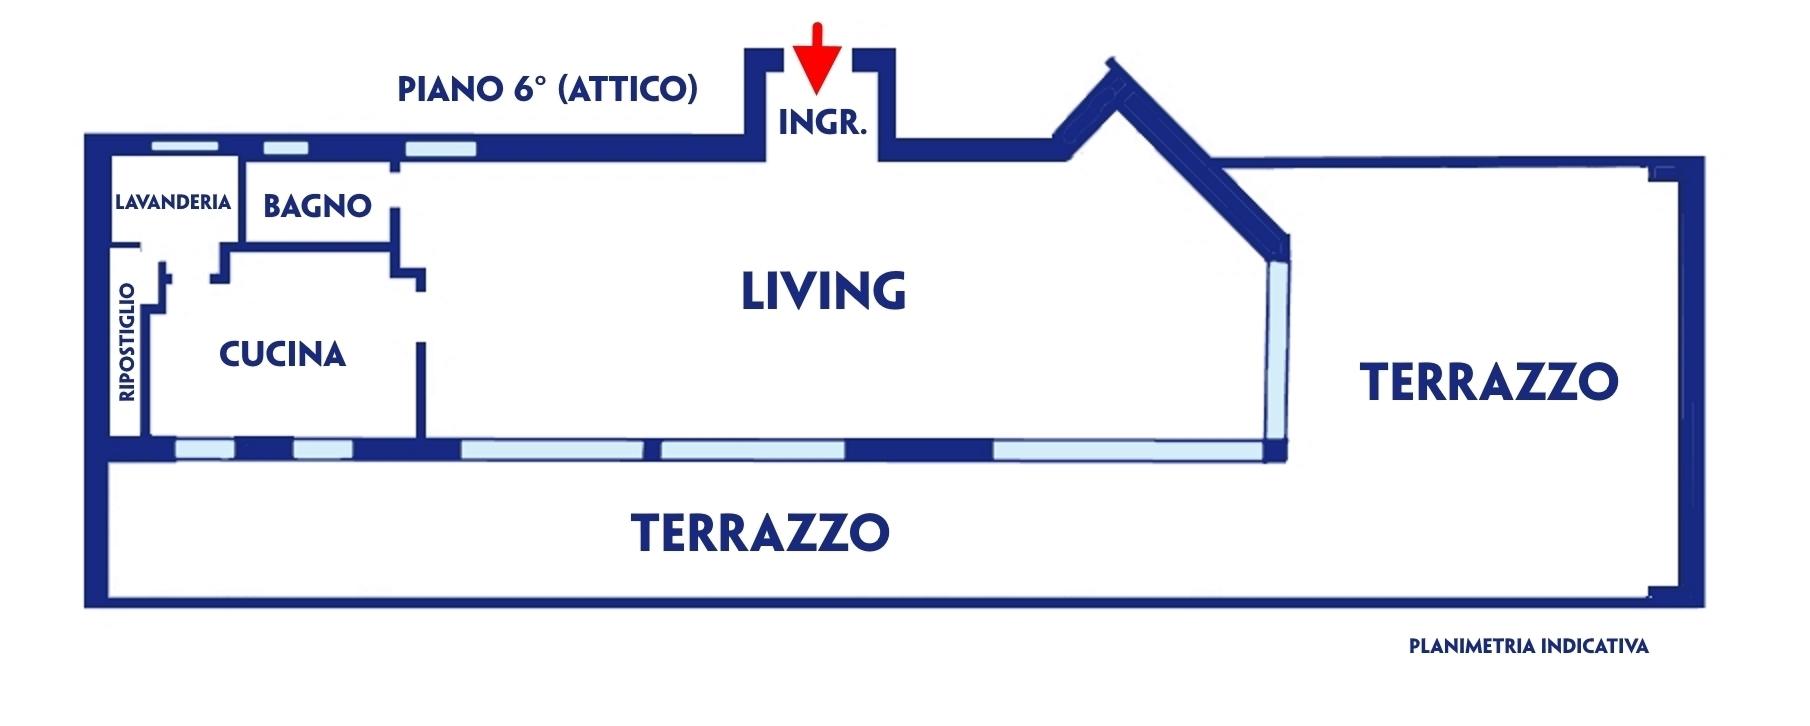 Planimetria Piano 6° (ATTICO)